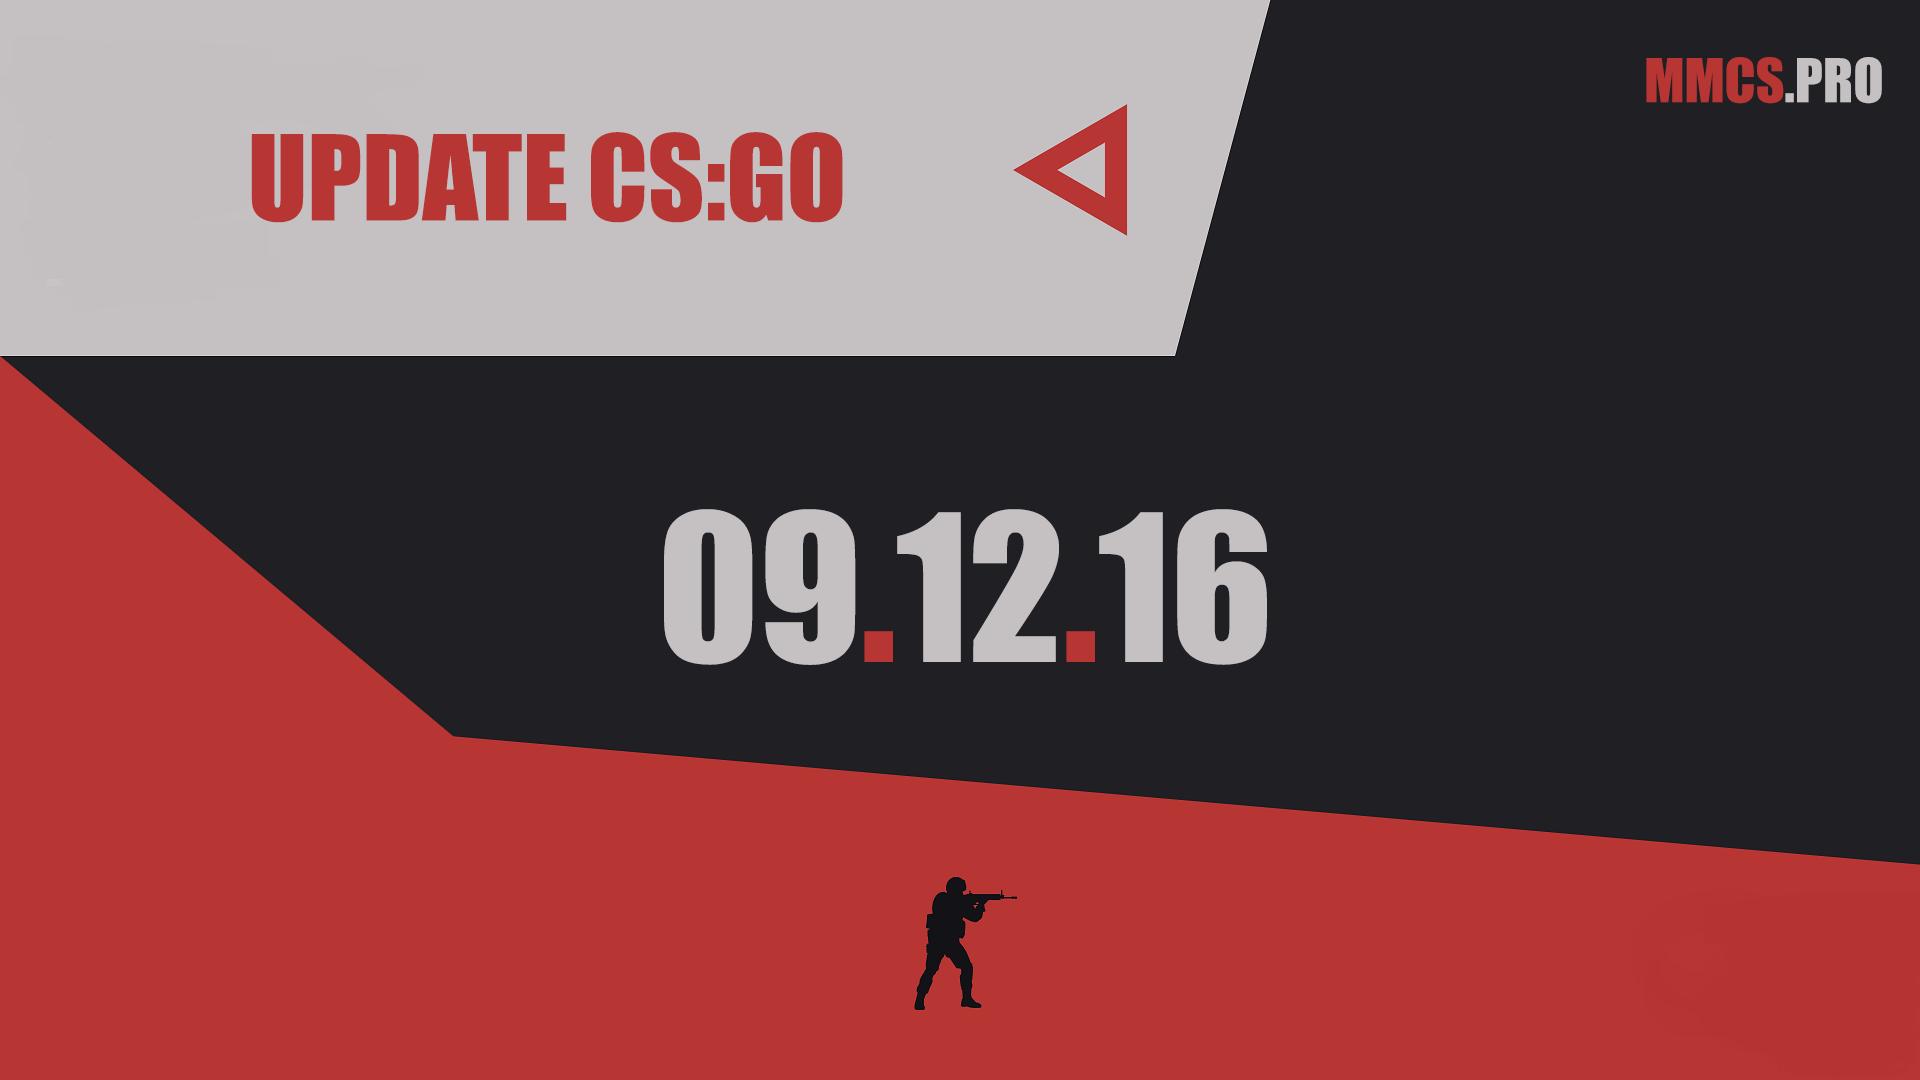 https://mmcs.pro/update-csgo-09-12-2016-valve/